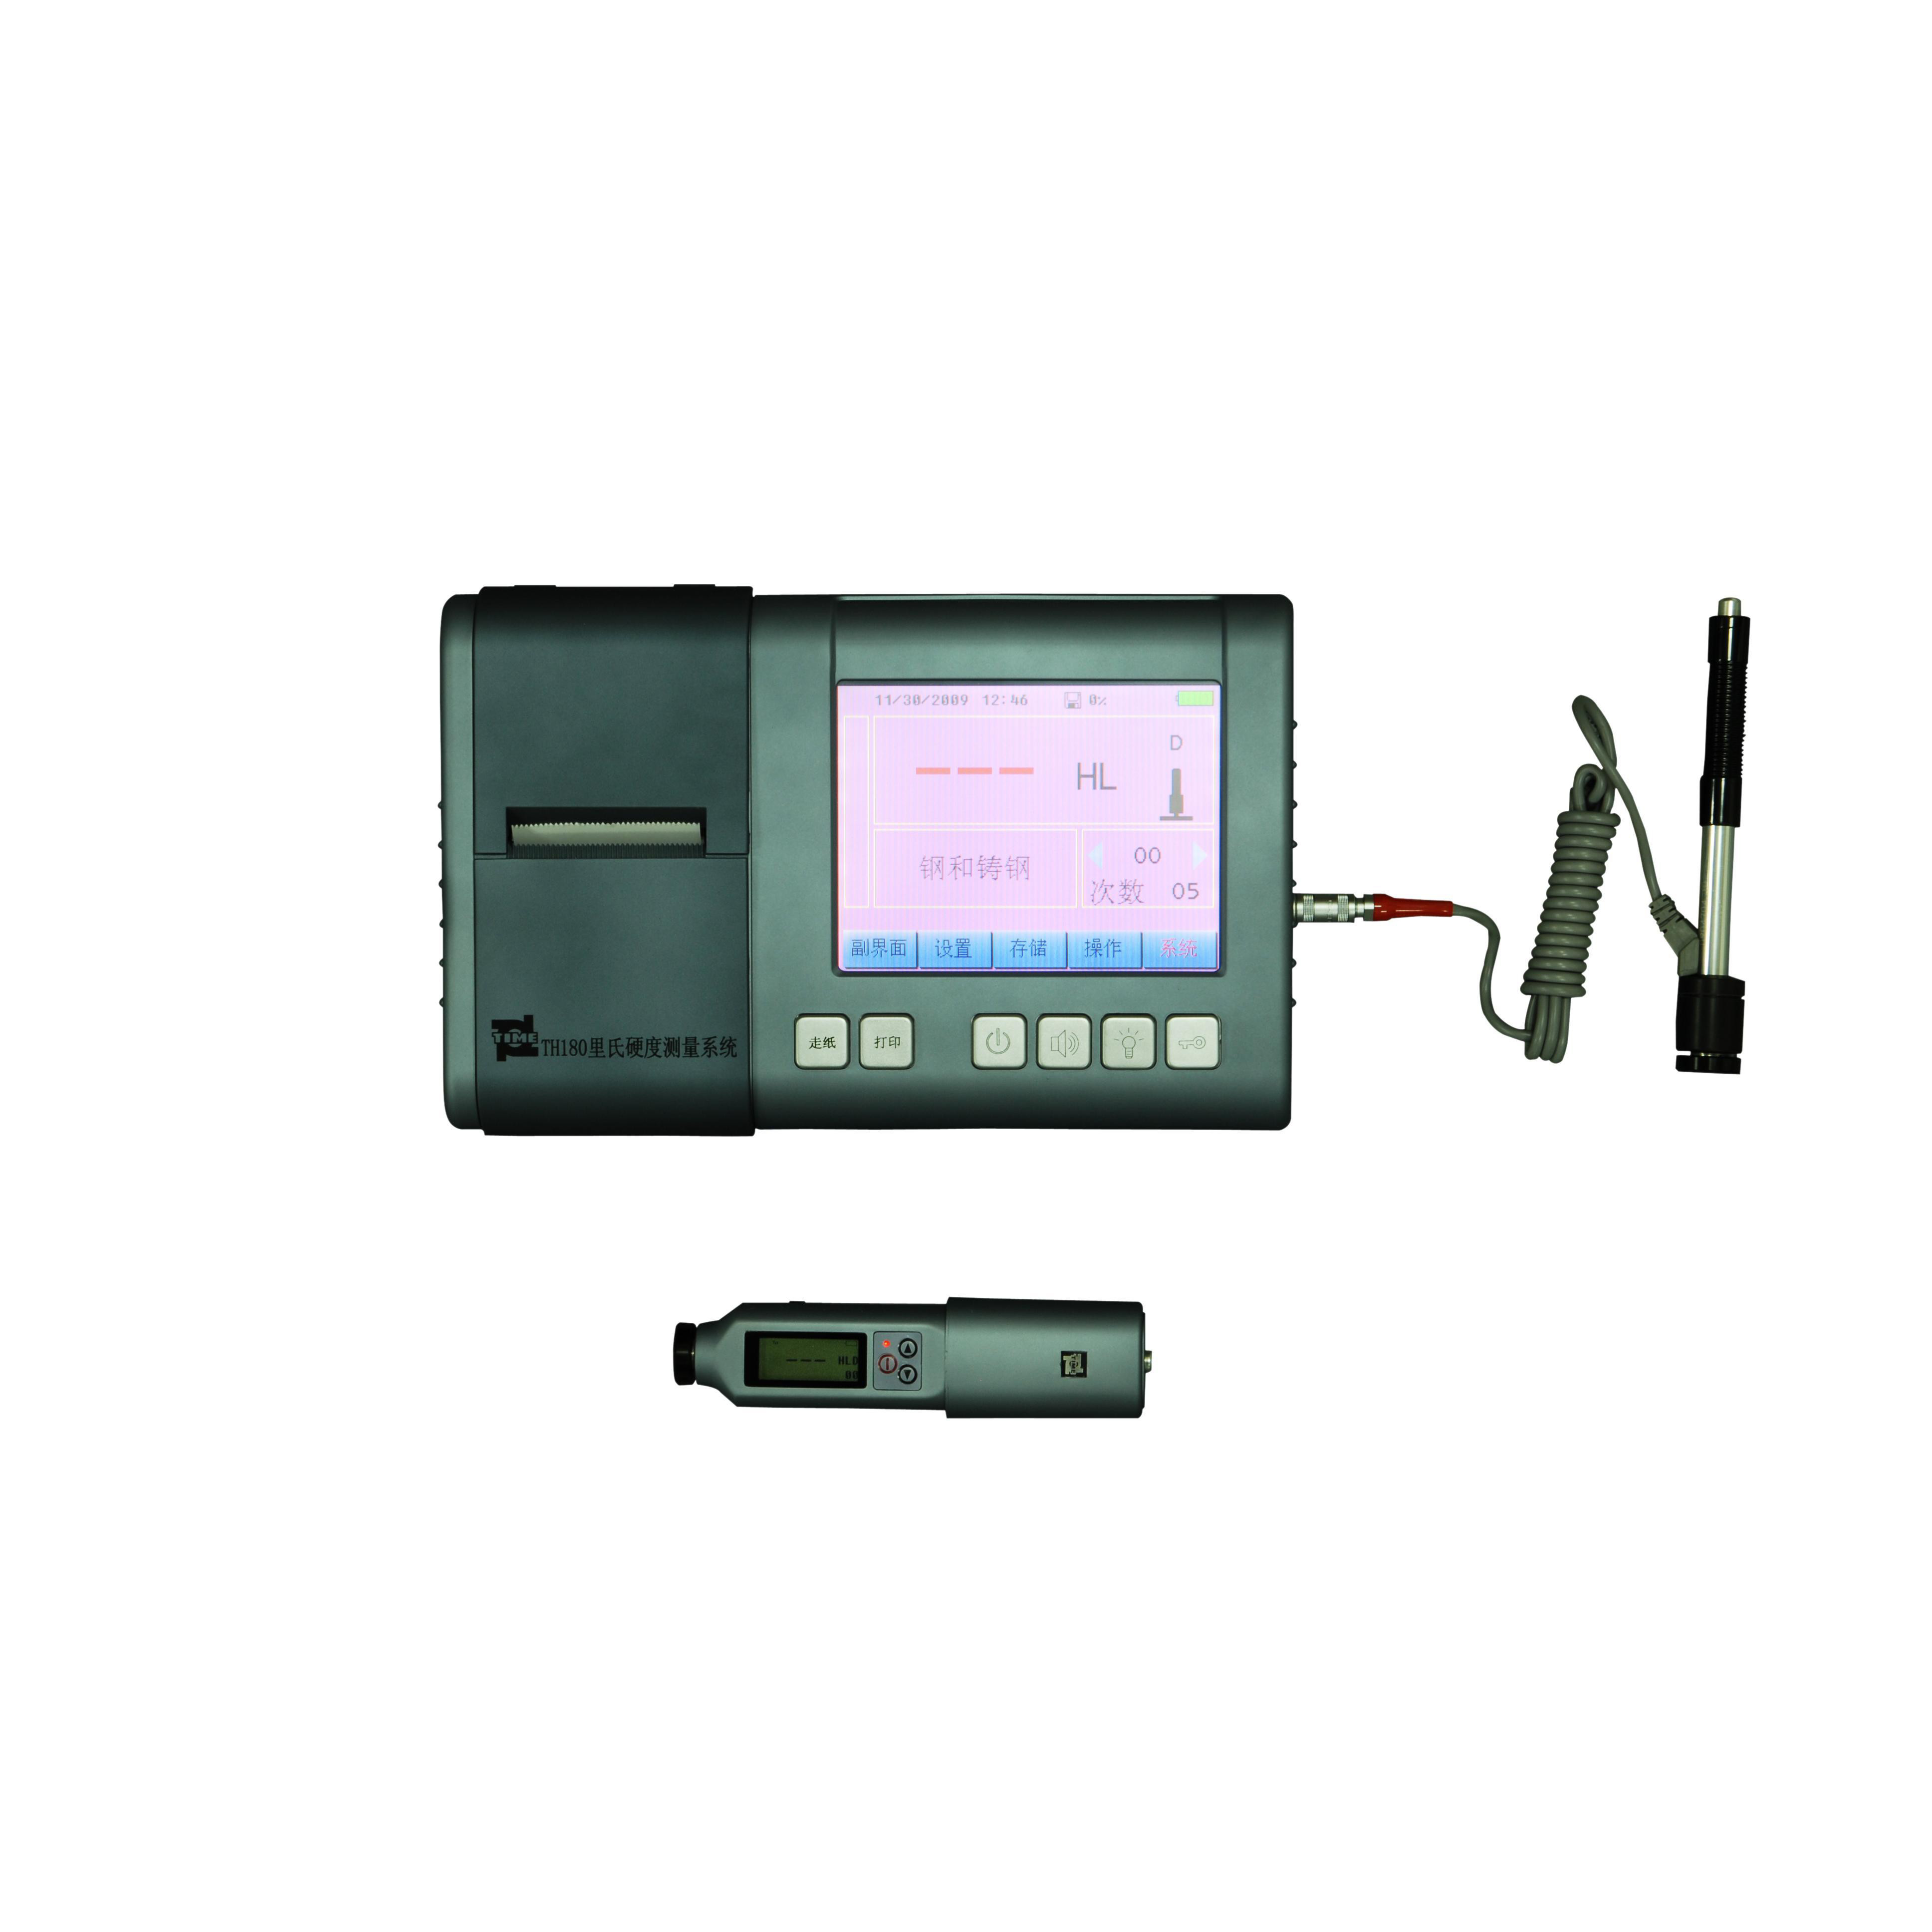 TIME®5200 - Portable Hardness Tester